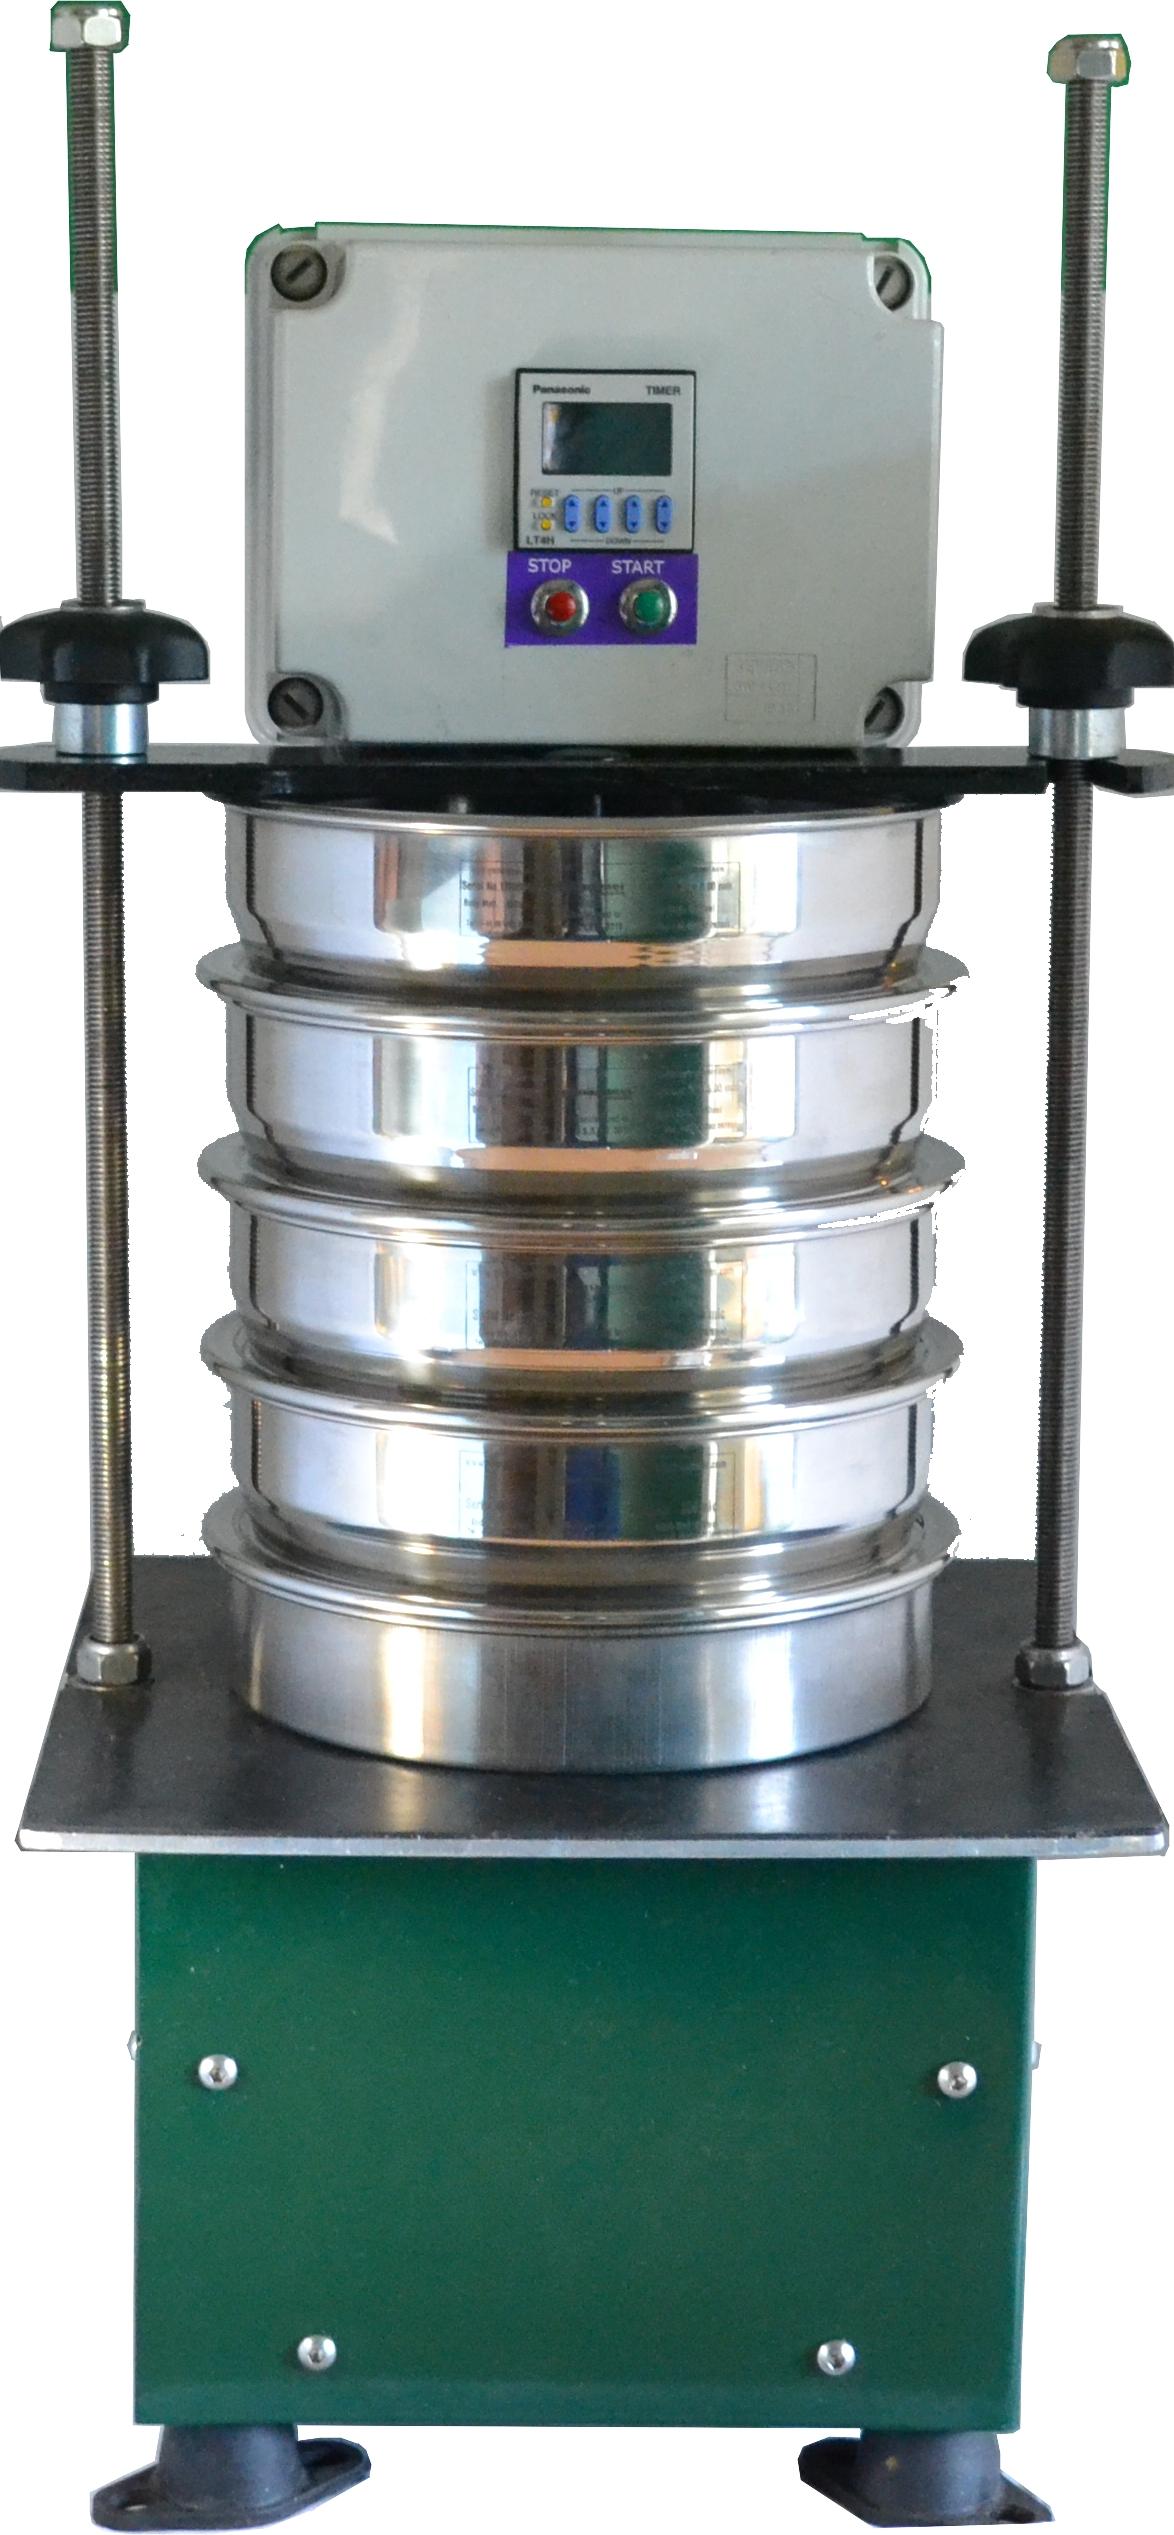 Kason进口实验筛配件︱振动摇摆筛︱旋转筛生产供应商-余盈工业 英国进口实验筛 英国进口实验筛报价